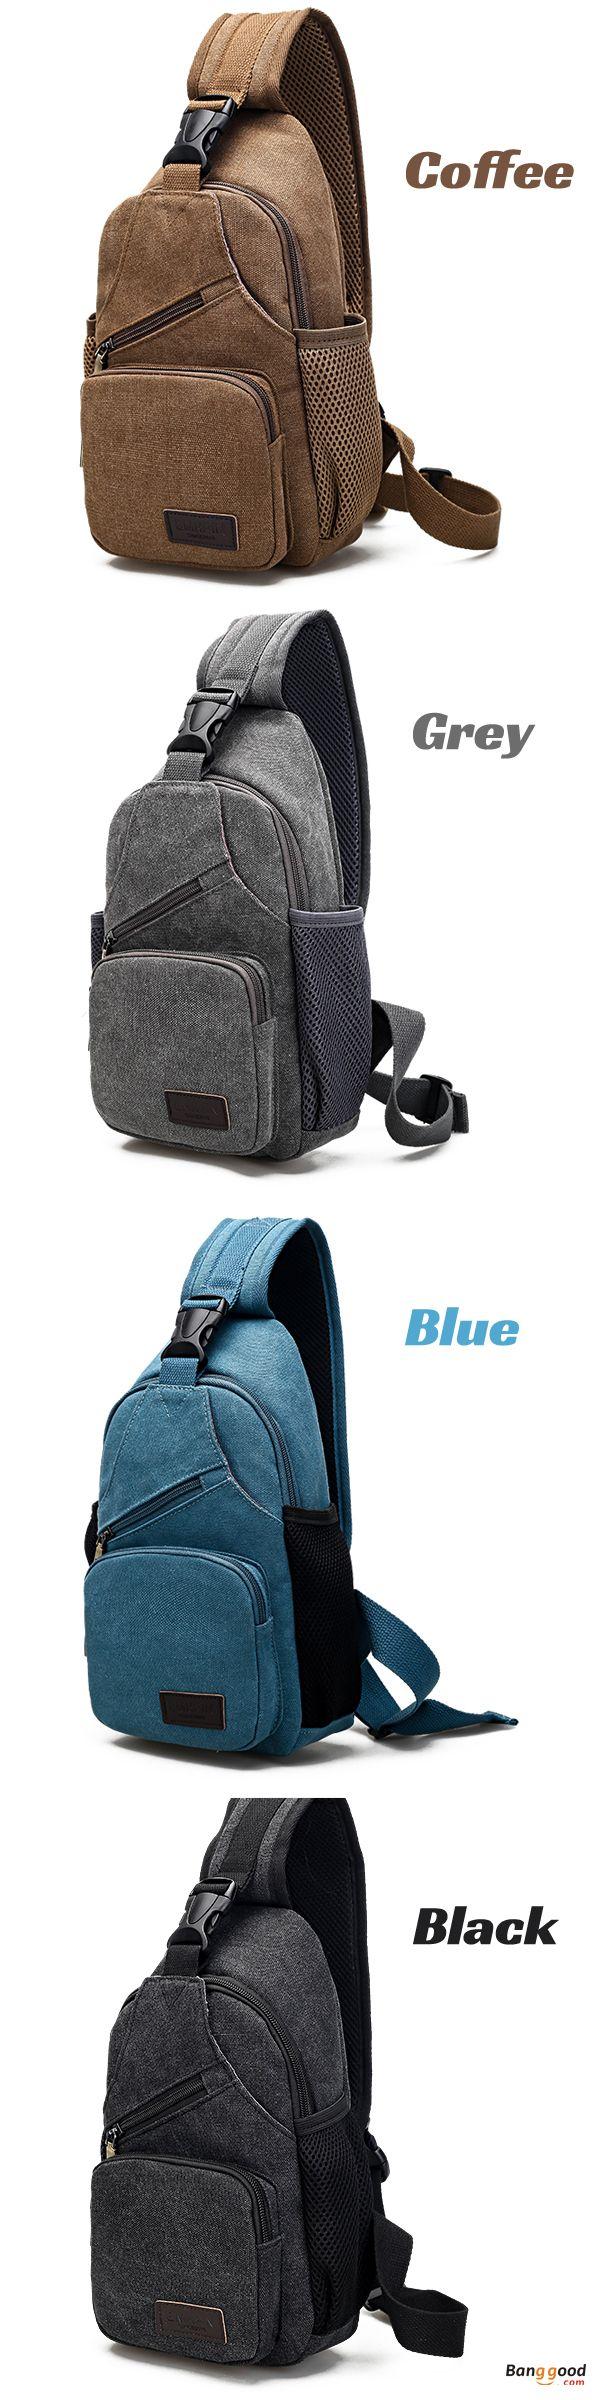 US$16.99 + Free shipping. #FlashDeal: 6 Days Remained. Casual Bag, Multifunctional Bag, Canvas Bag, Multi-pocket Bag, iPad Bag, Phone Bag, Storage Bag, Chest Bag. Material: Canvas. Color: Black, Coffee,  Khaki, Grey, Blue.